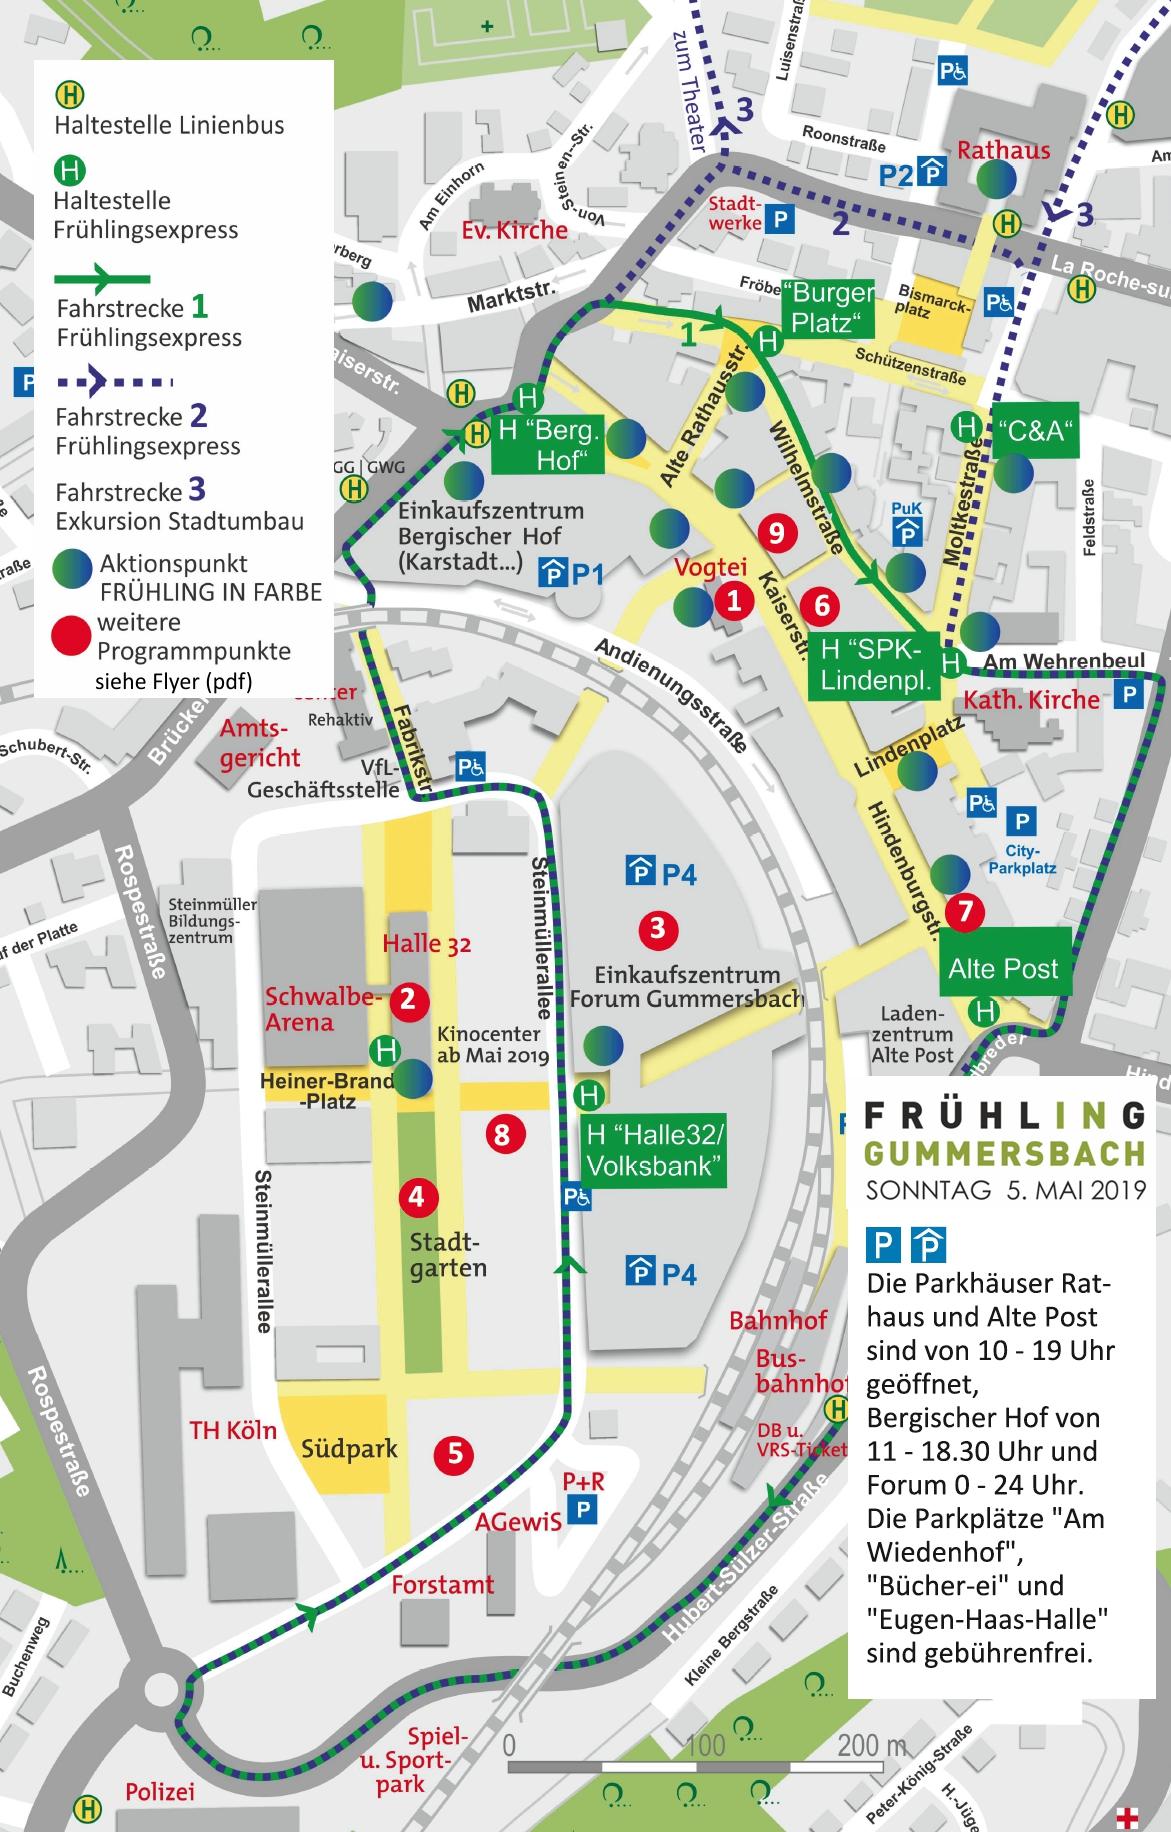 Frühling in Gummersbach 2019 Karte Aktionspunkte